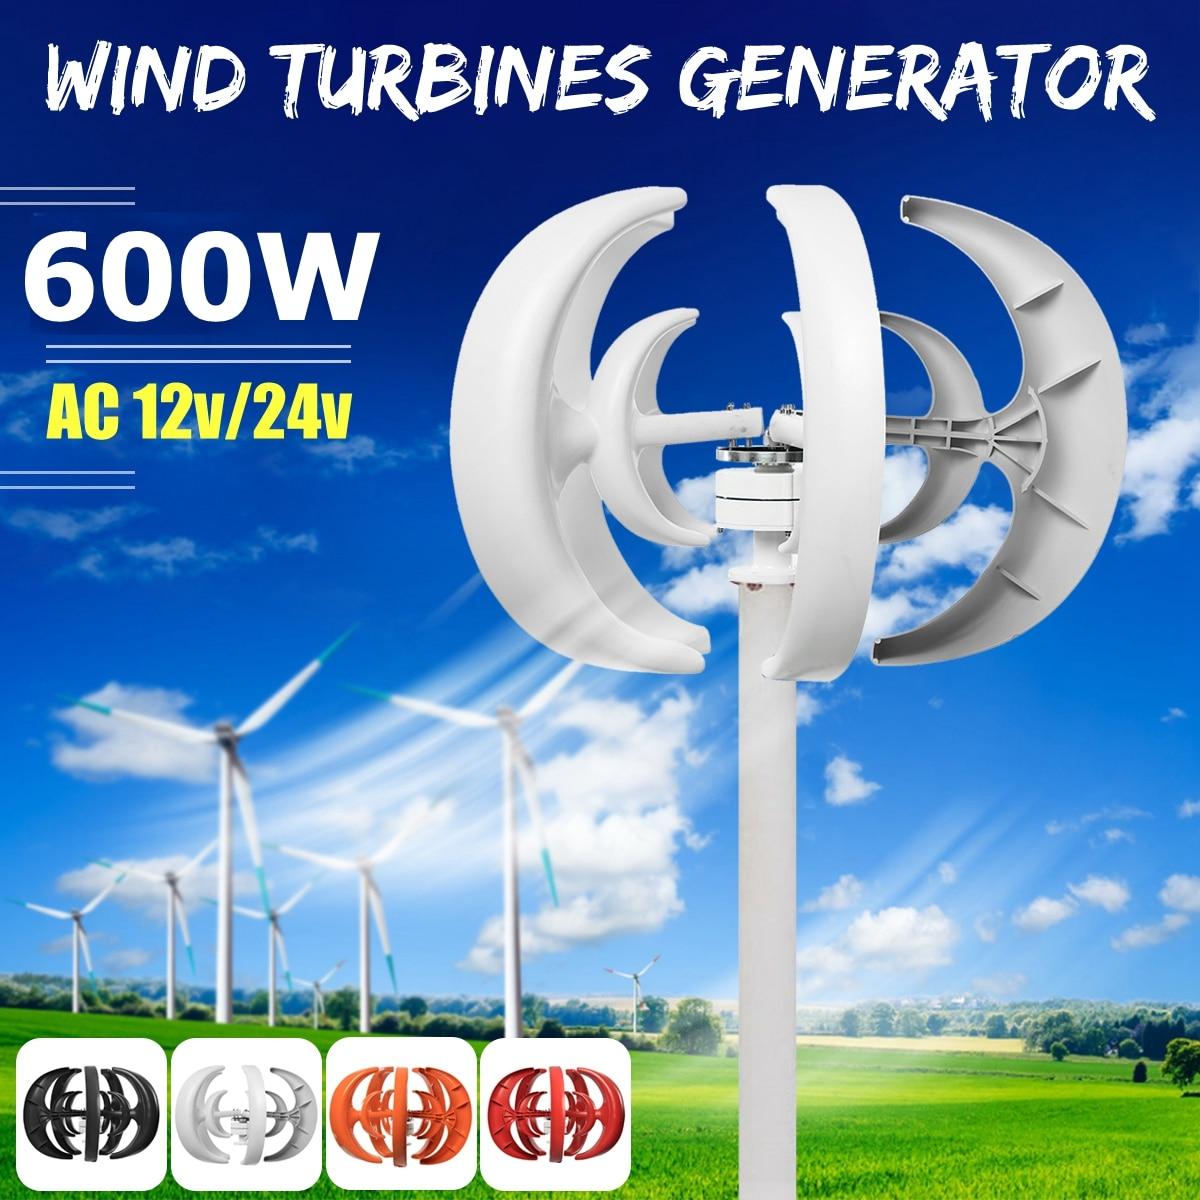 Max 600 w AC 12 v 24 v Vento Generatore di Turbina Lanterna 5 Lame Kit Motore Asse Verticale